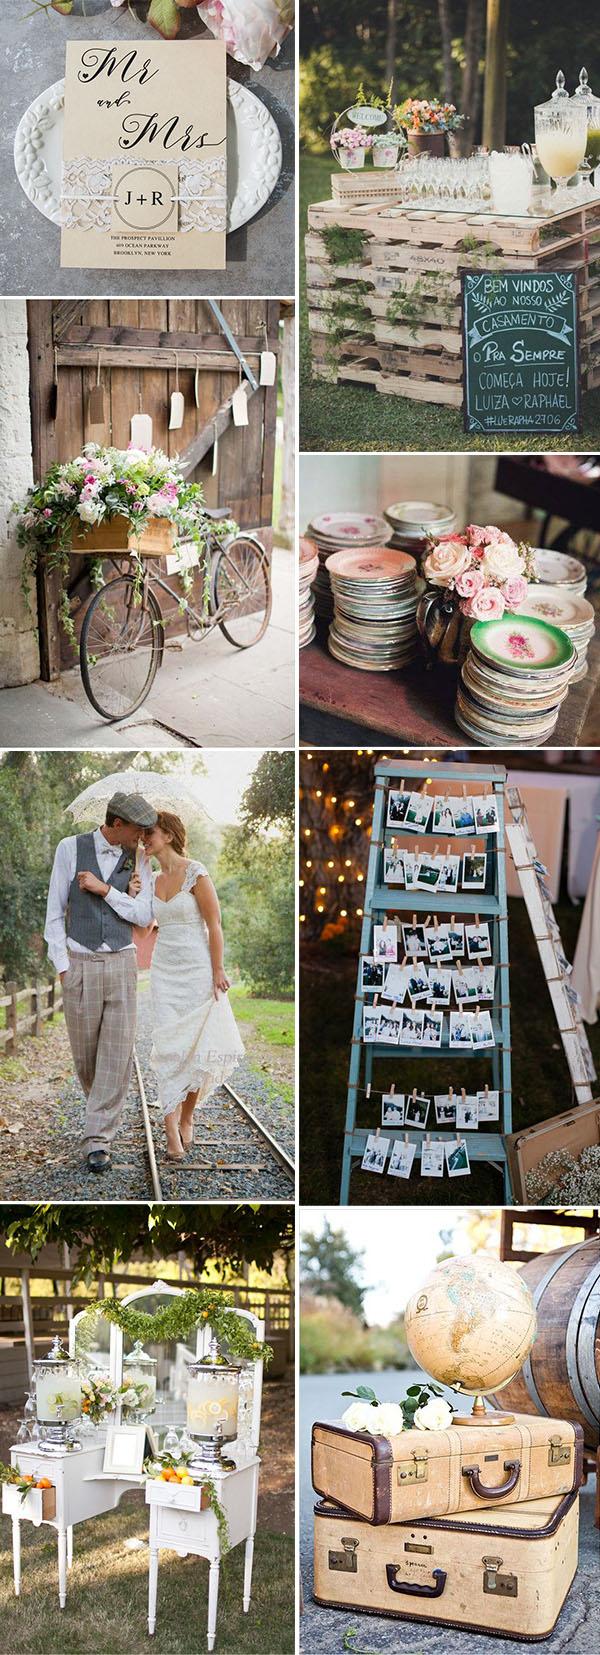 Diy Vintage Wedding 20 Inspiring Vintage Wedding Centerpieces Ideas